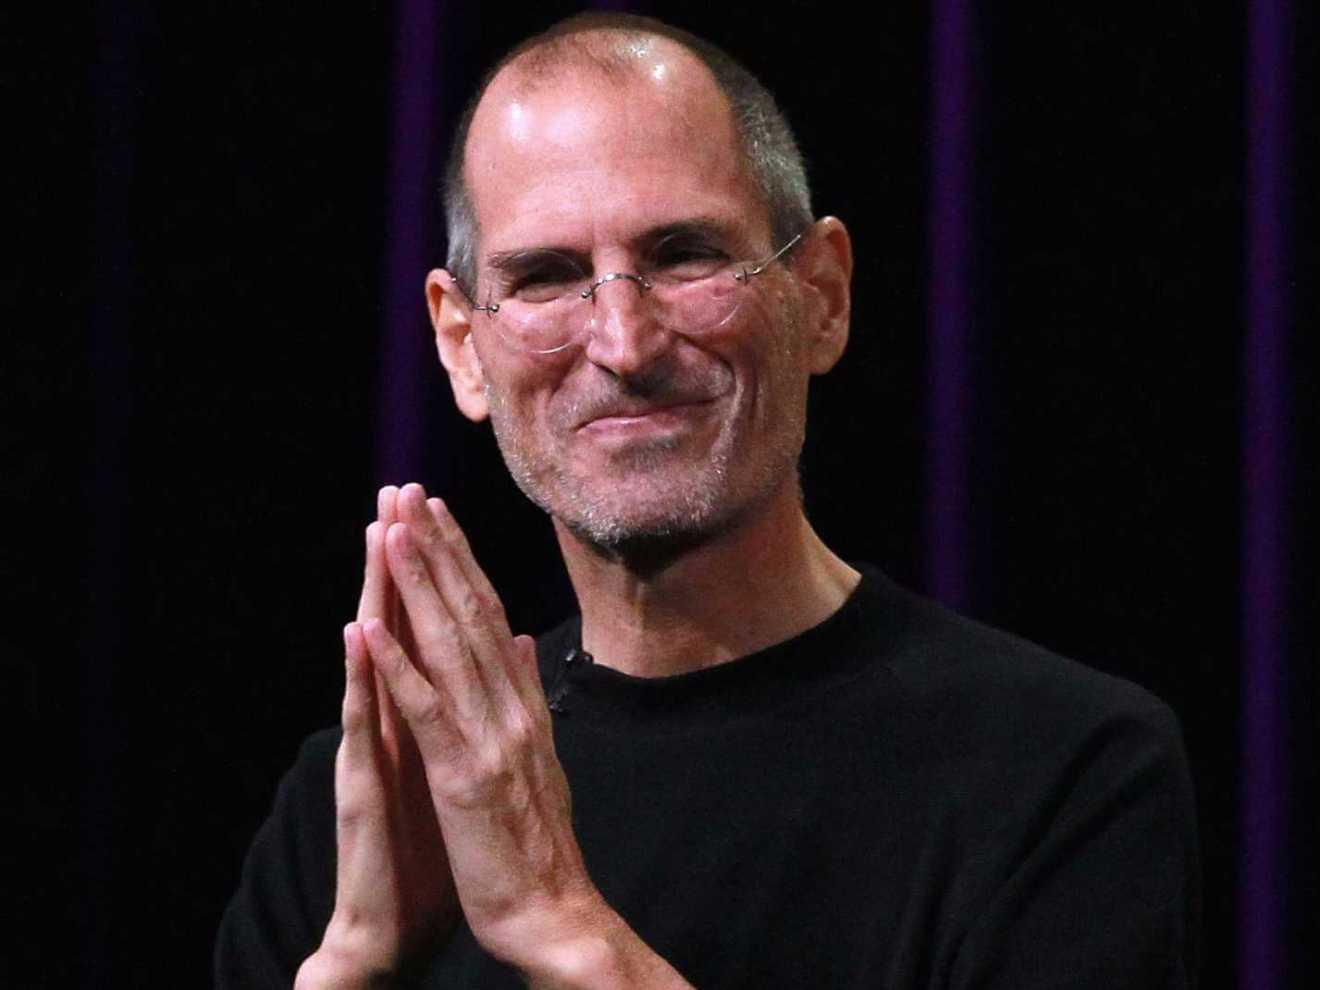 the new steve jobs documentary is a blistering takedown that is deeply unflattering - Apple está deixando de ser inovadora e não há mais Steve Jobs para salvar a empresa